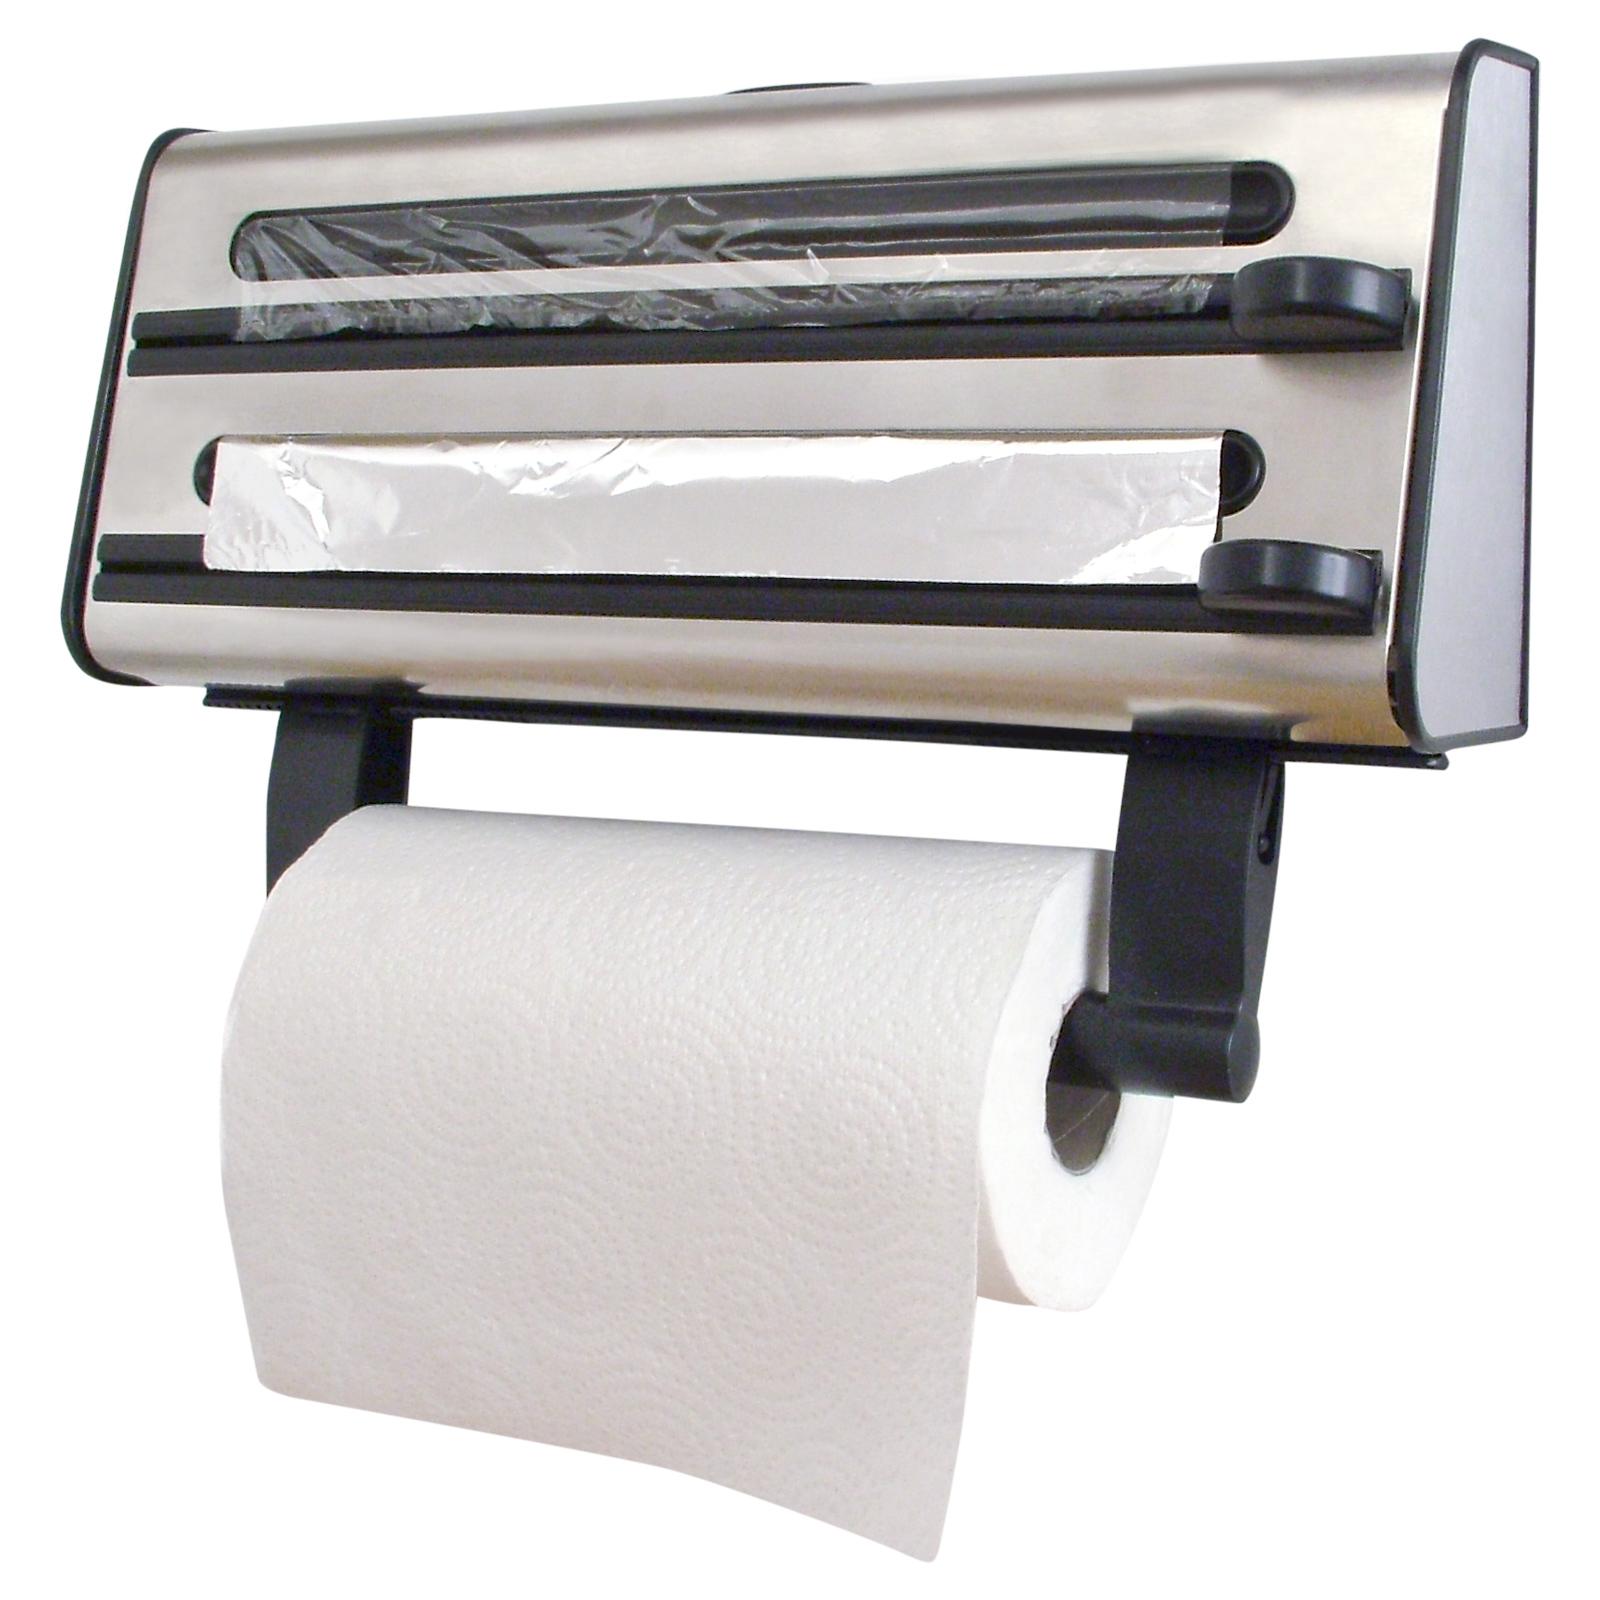 Kitchen Triple Roll Dispenser Cling Film Tin Foil Towel